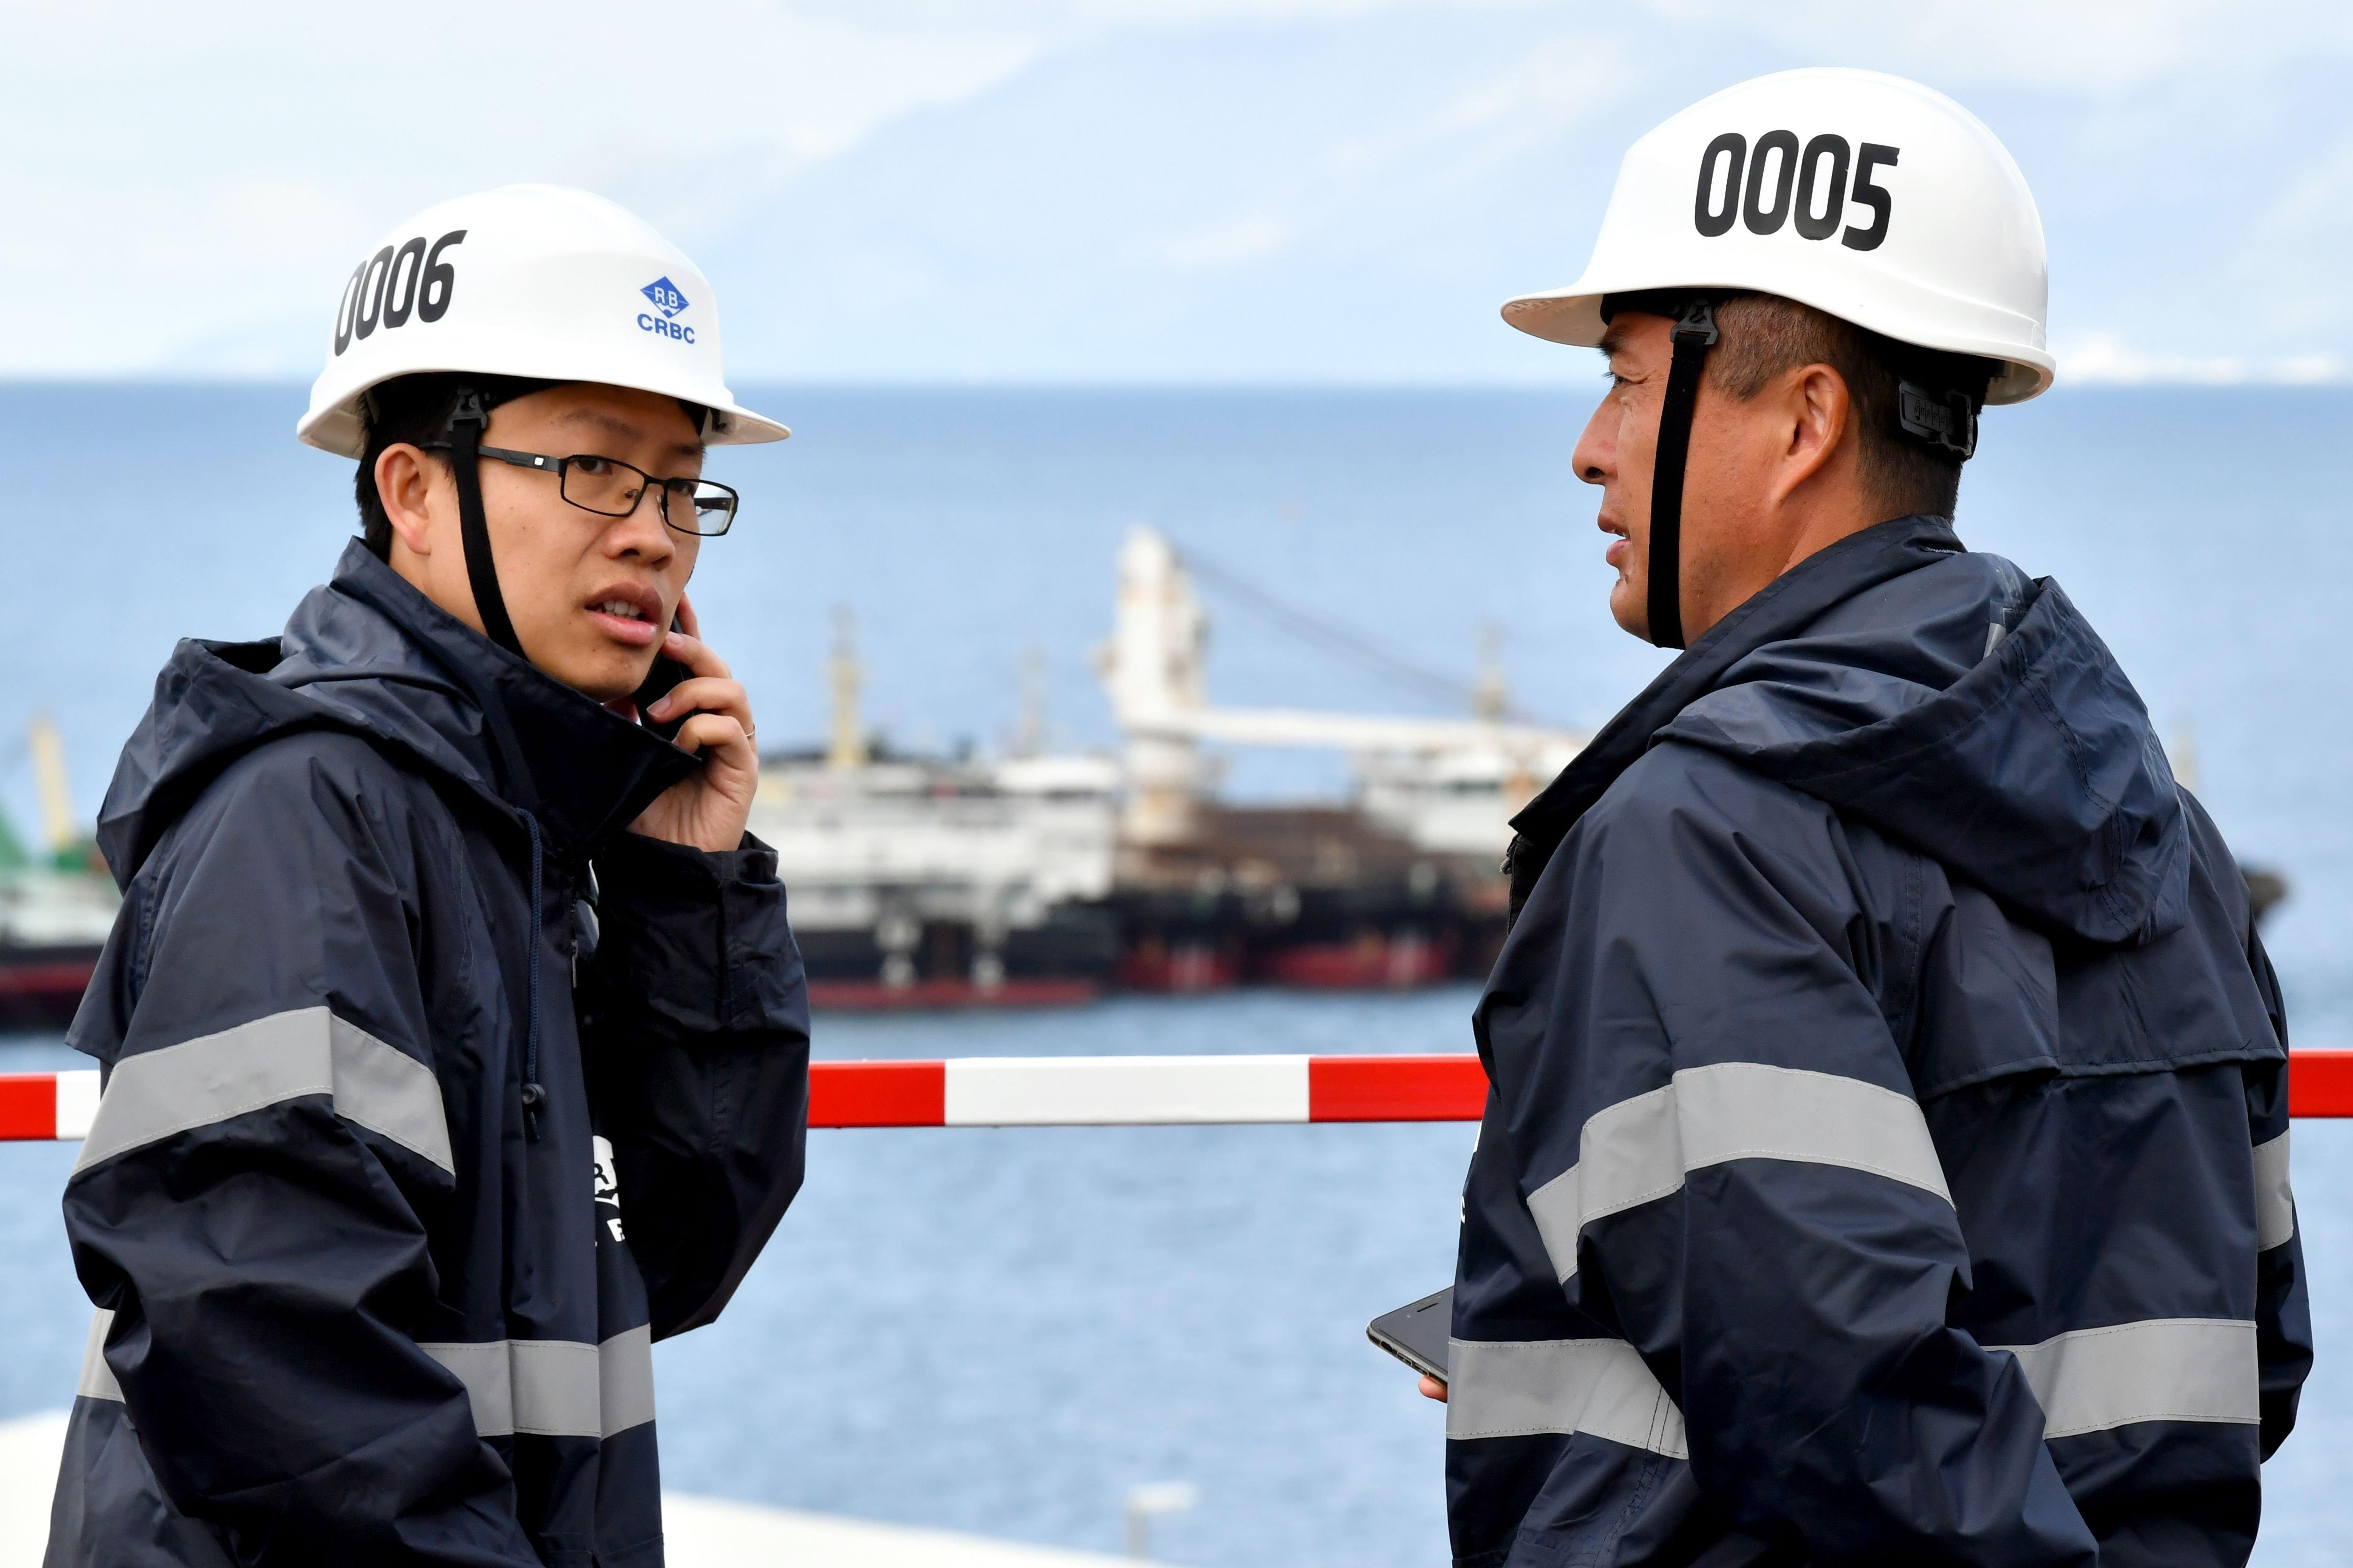 China wants to fund Thailand's US$12 billion high-speed railway